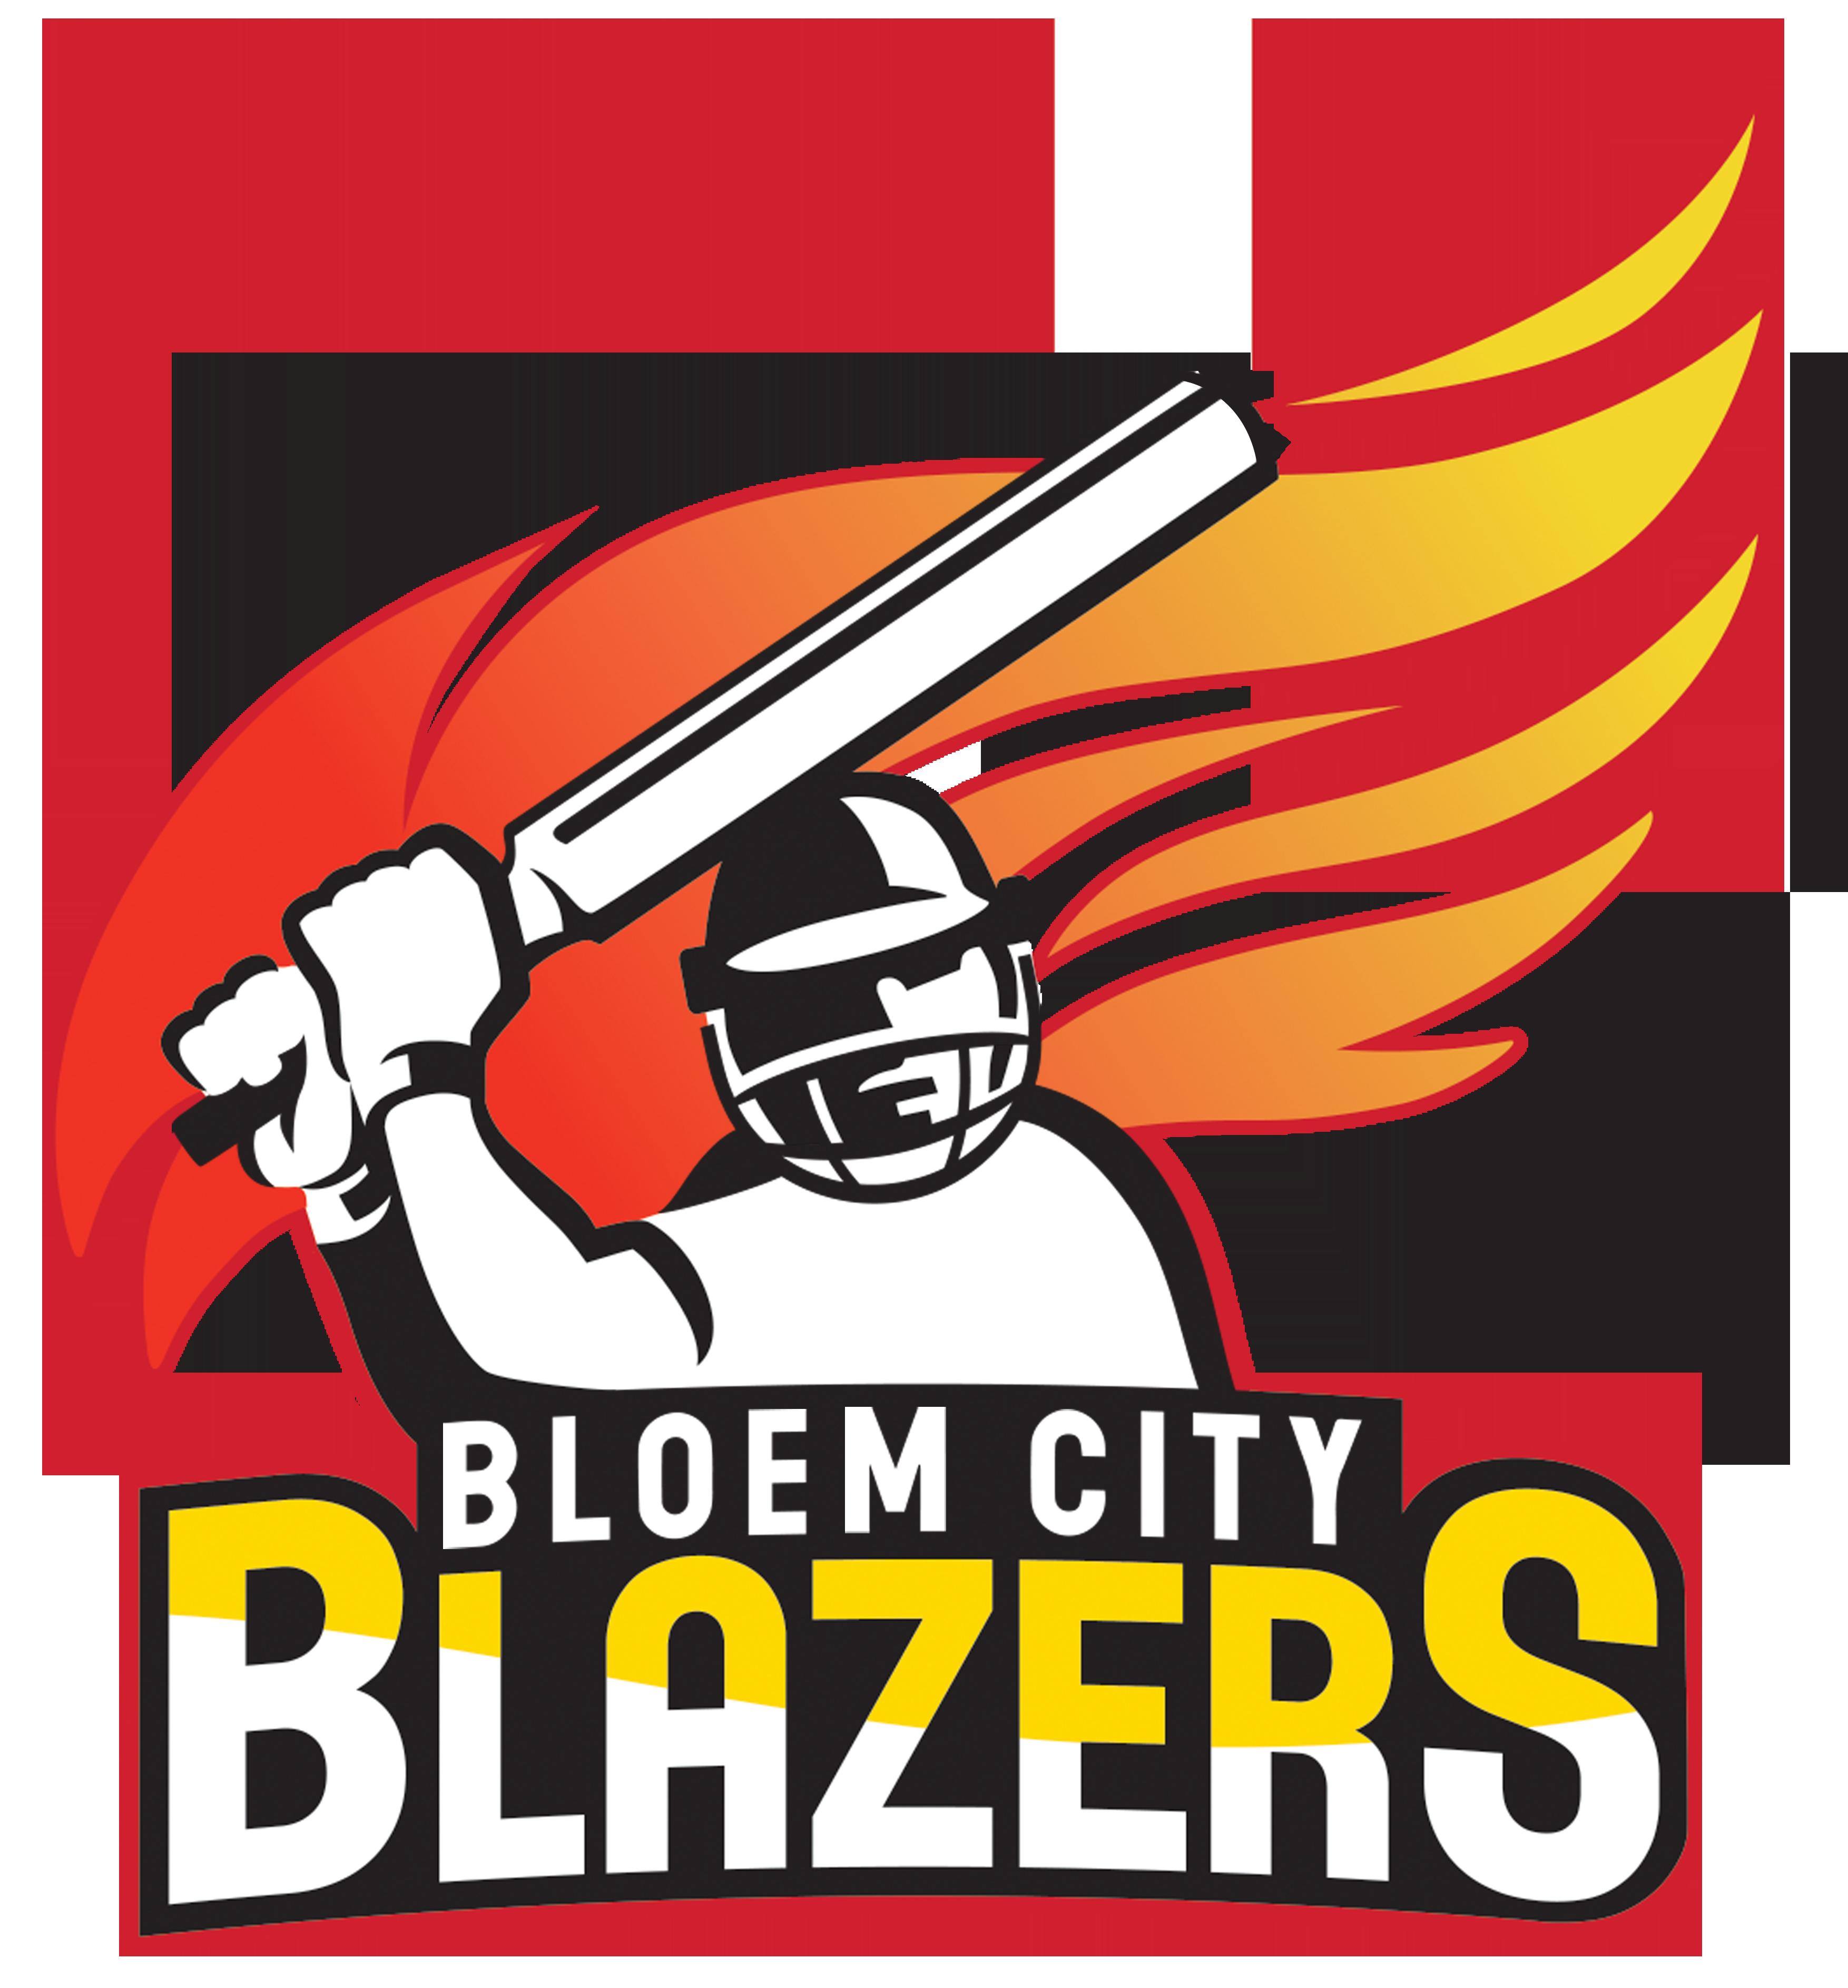 Blazers Team Logo: Hong Kong Owners Unveil Bloem City Blazers As Franchise